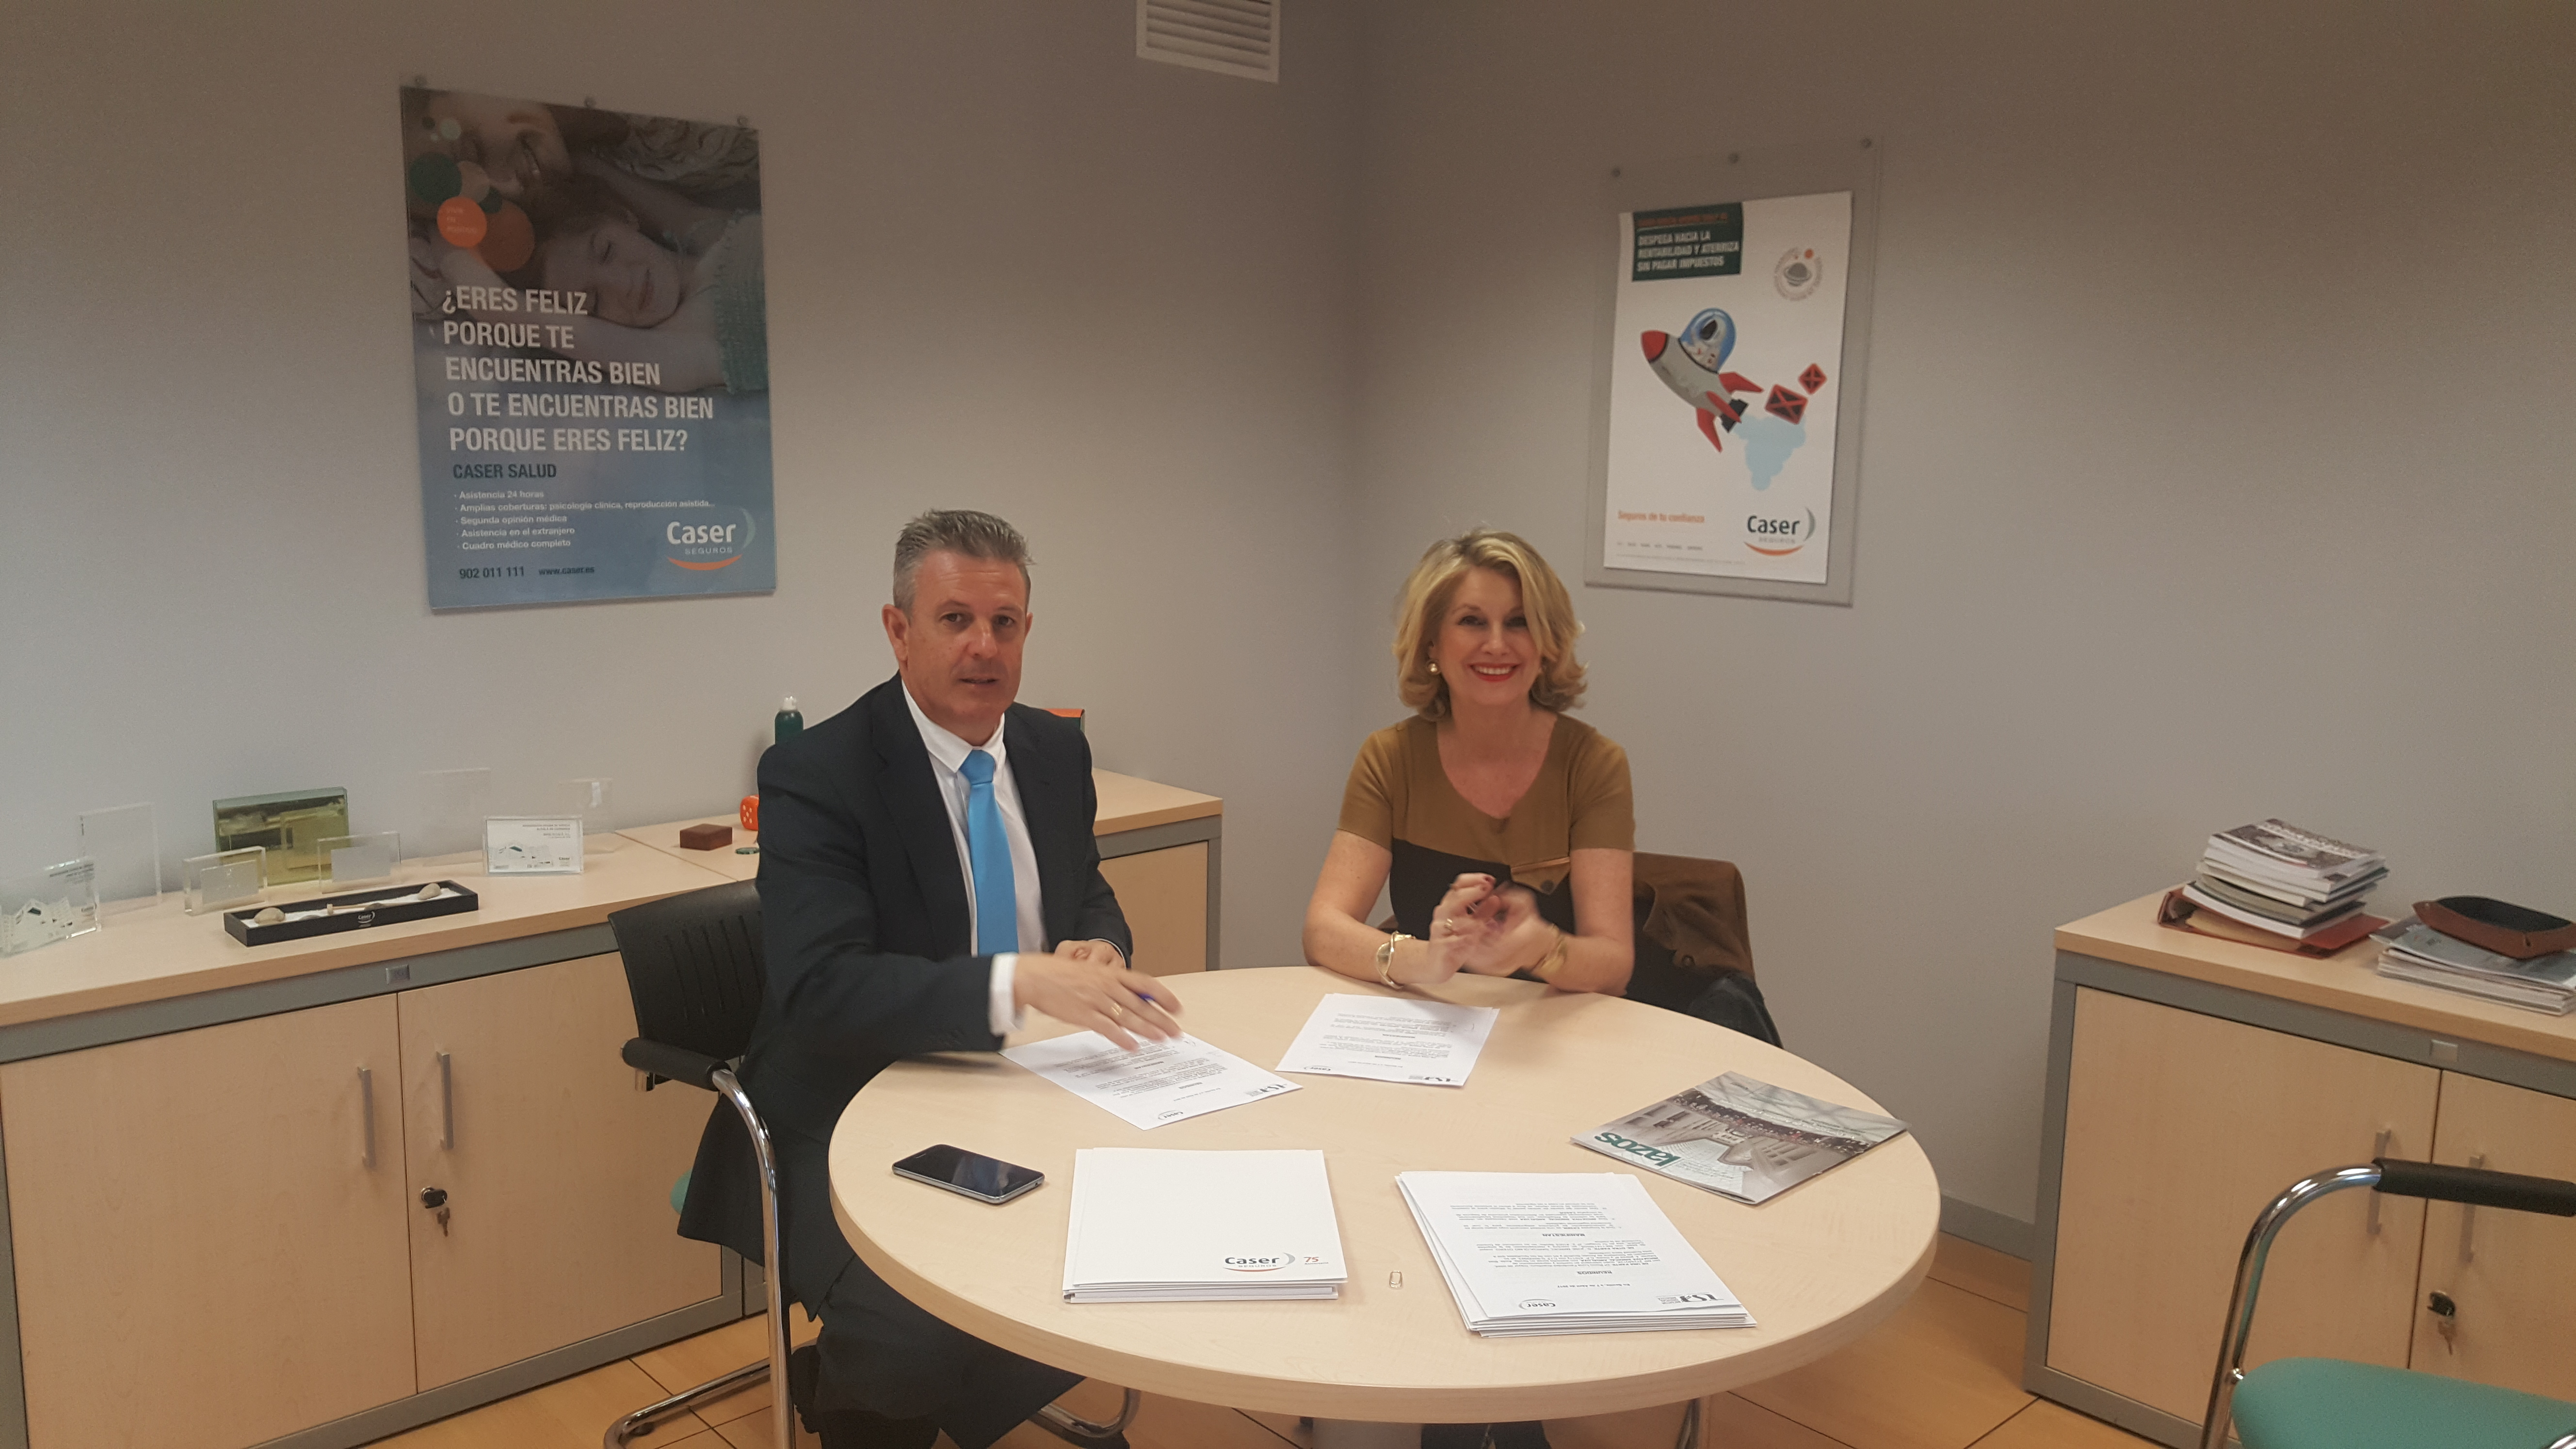 Nuevas ofertas caser seguros iniciativa sindical andaluza - Caser salud dental ...